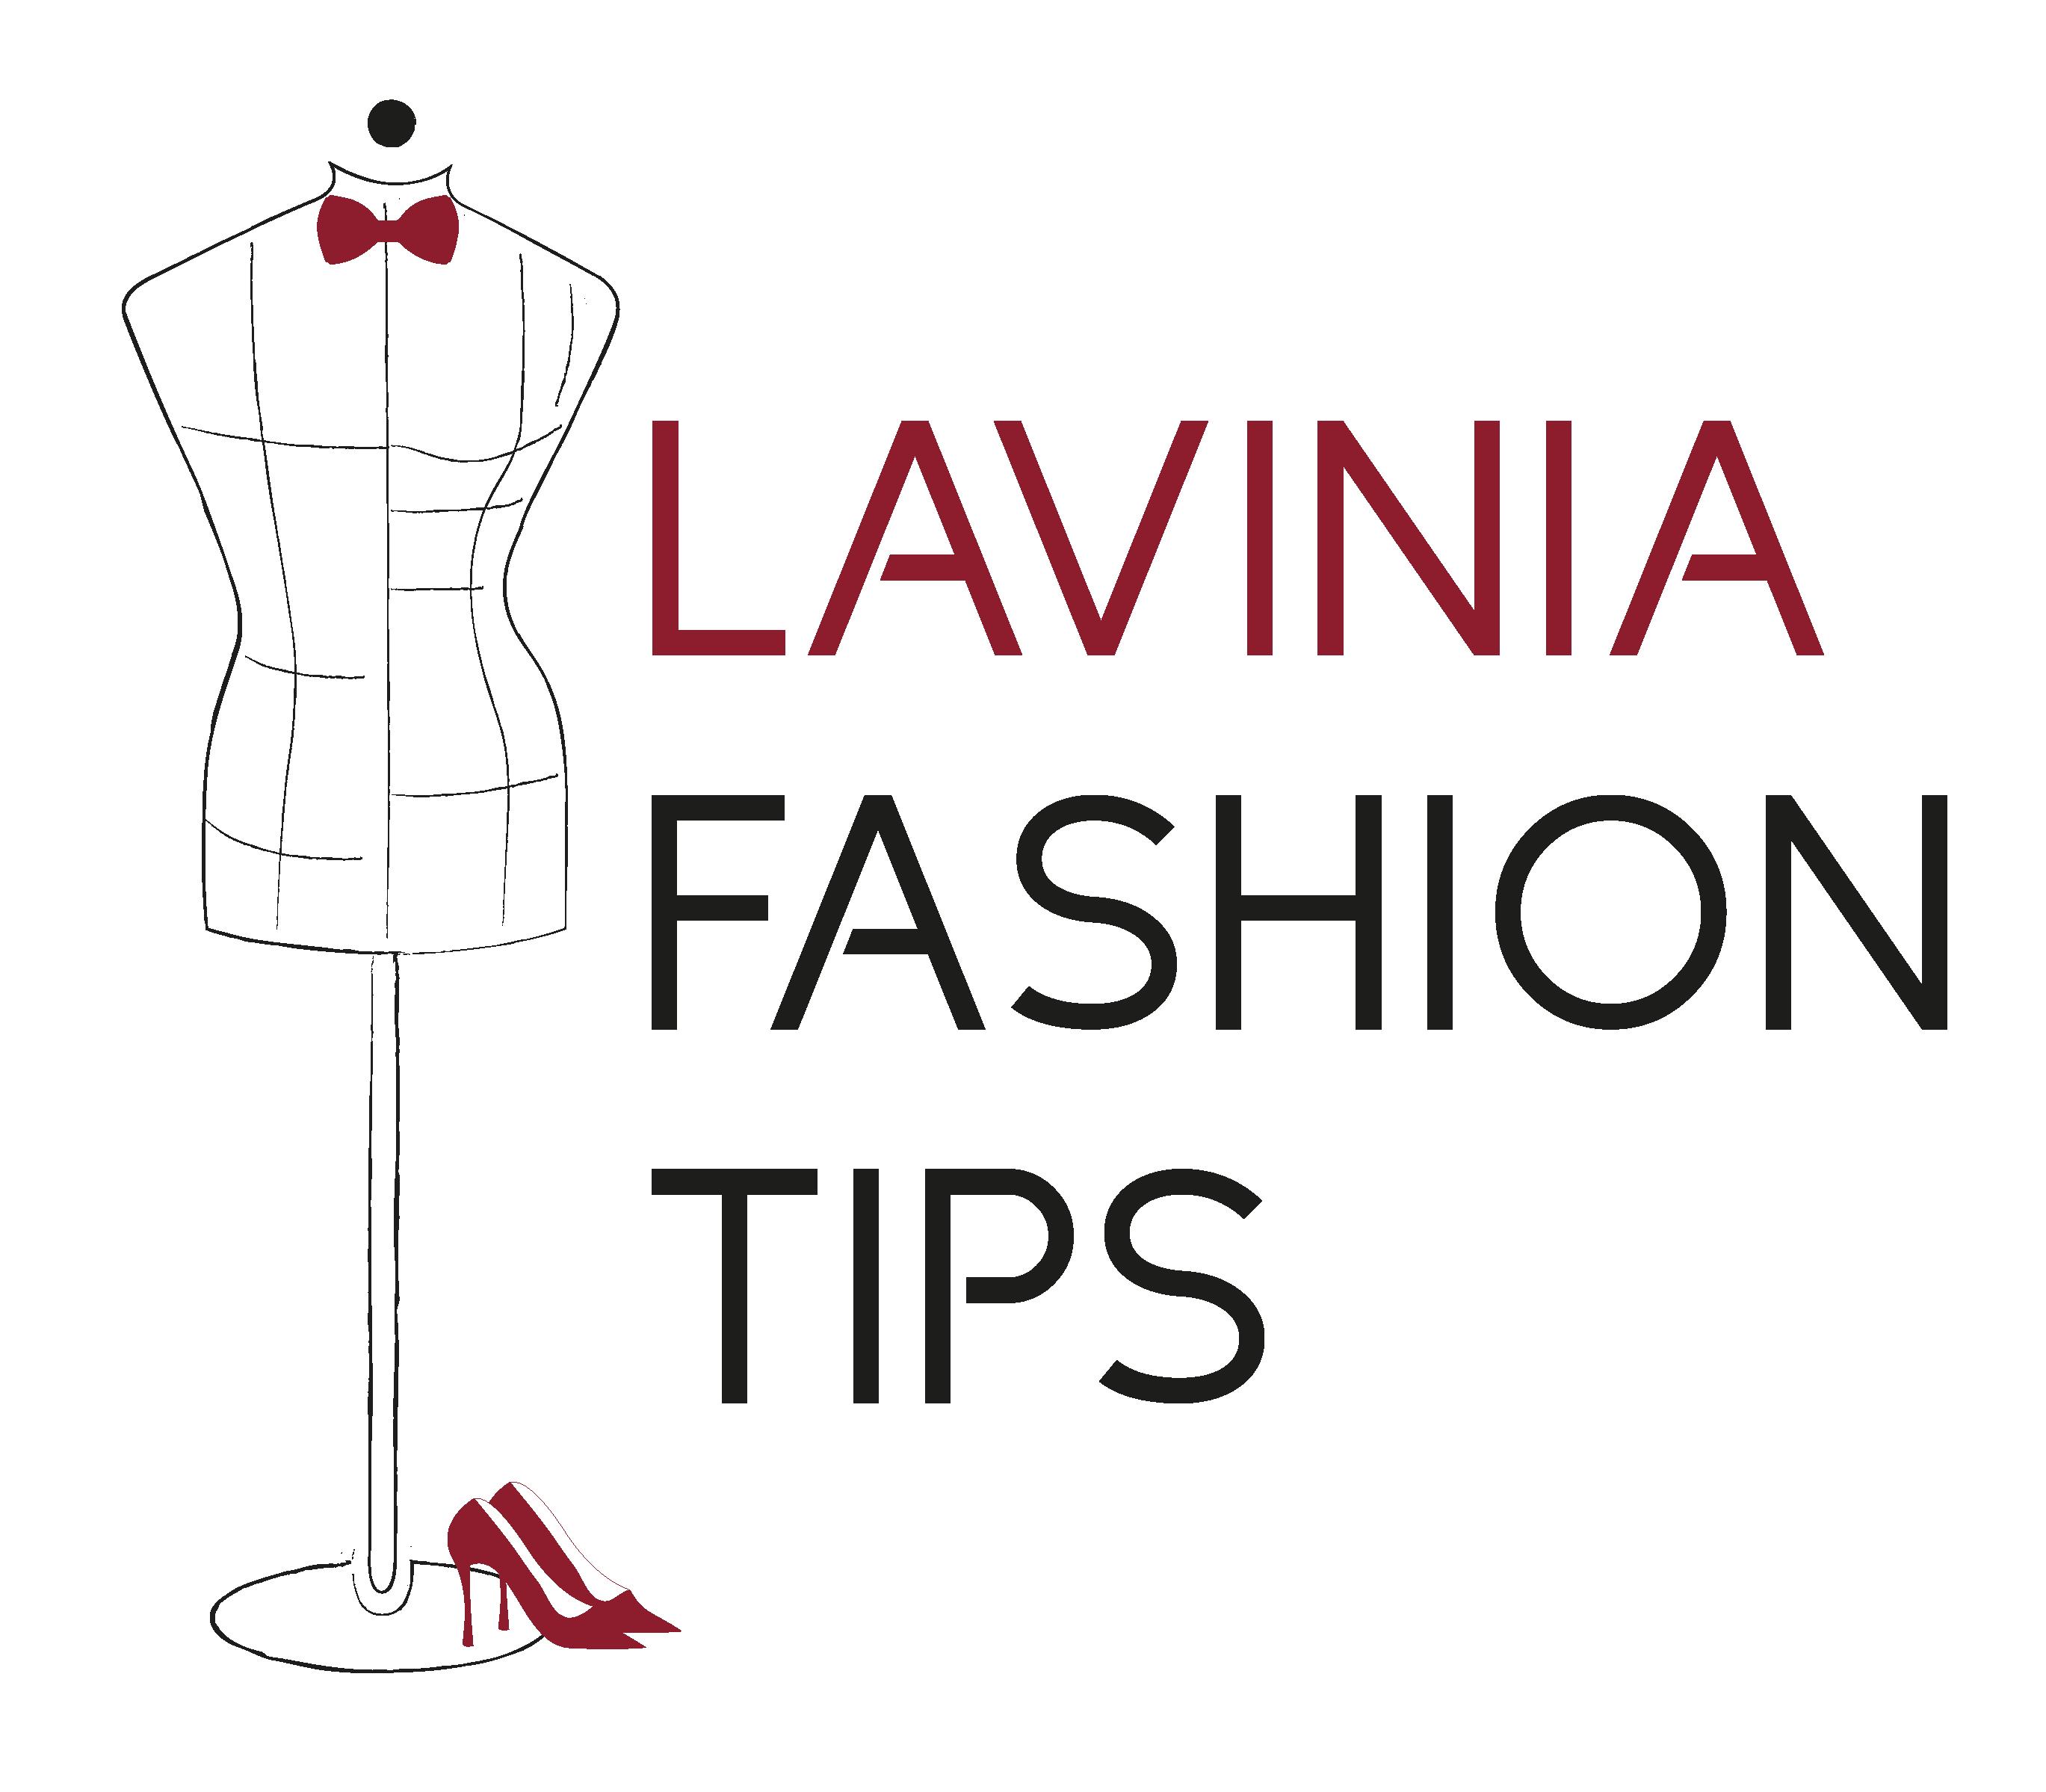 LaviniaFashionTips